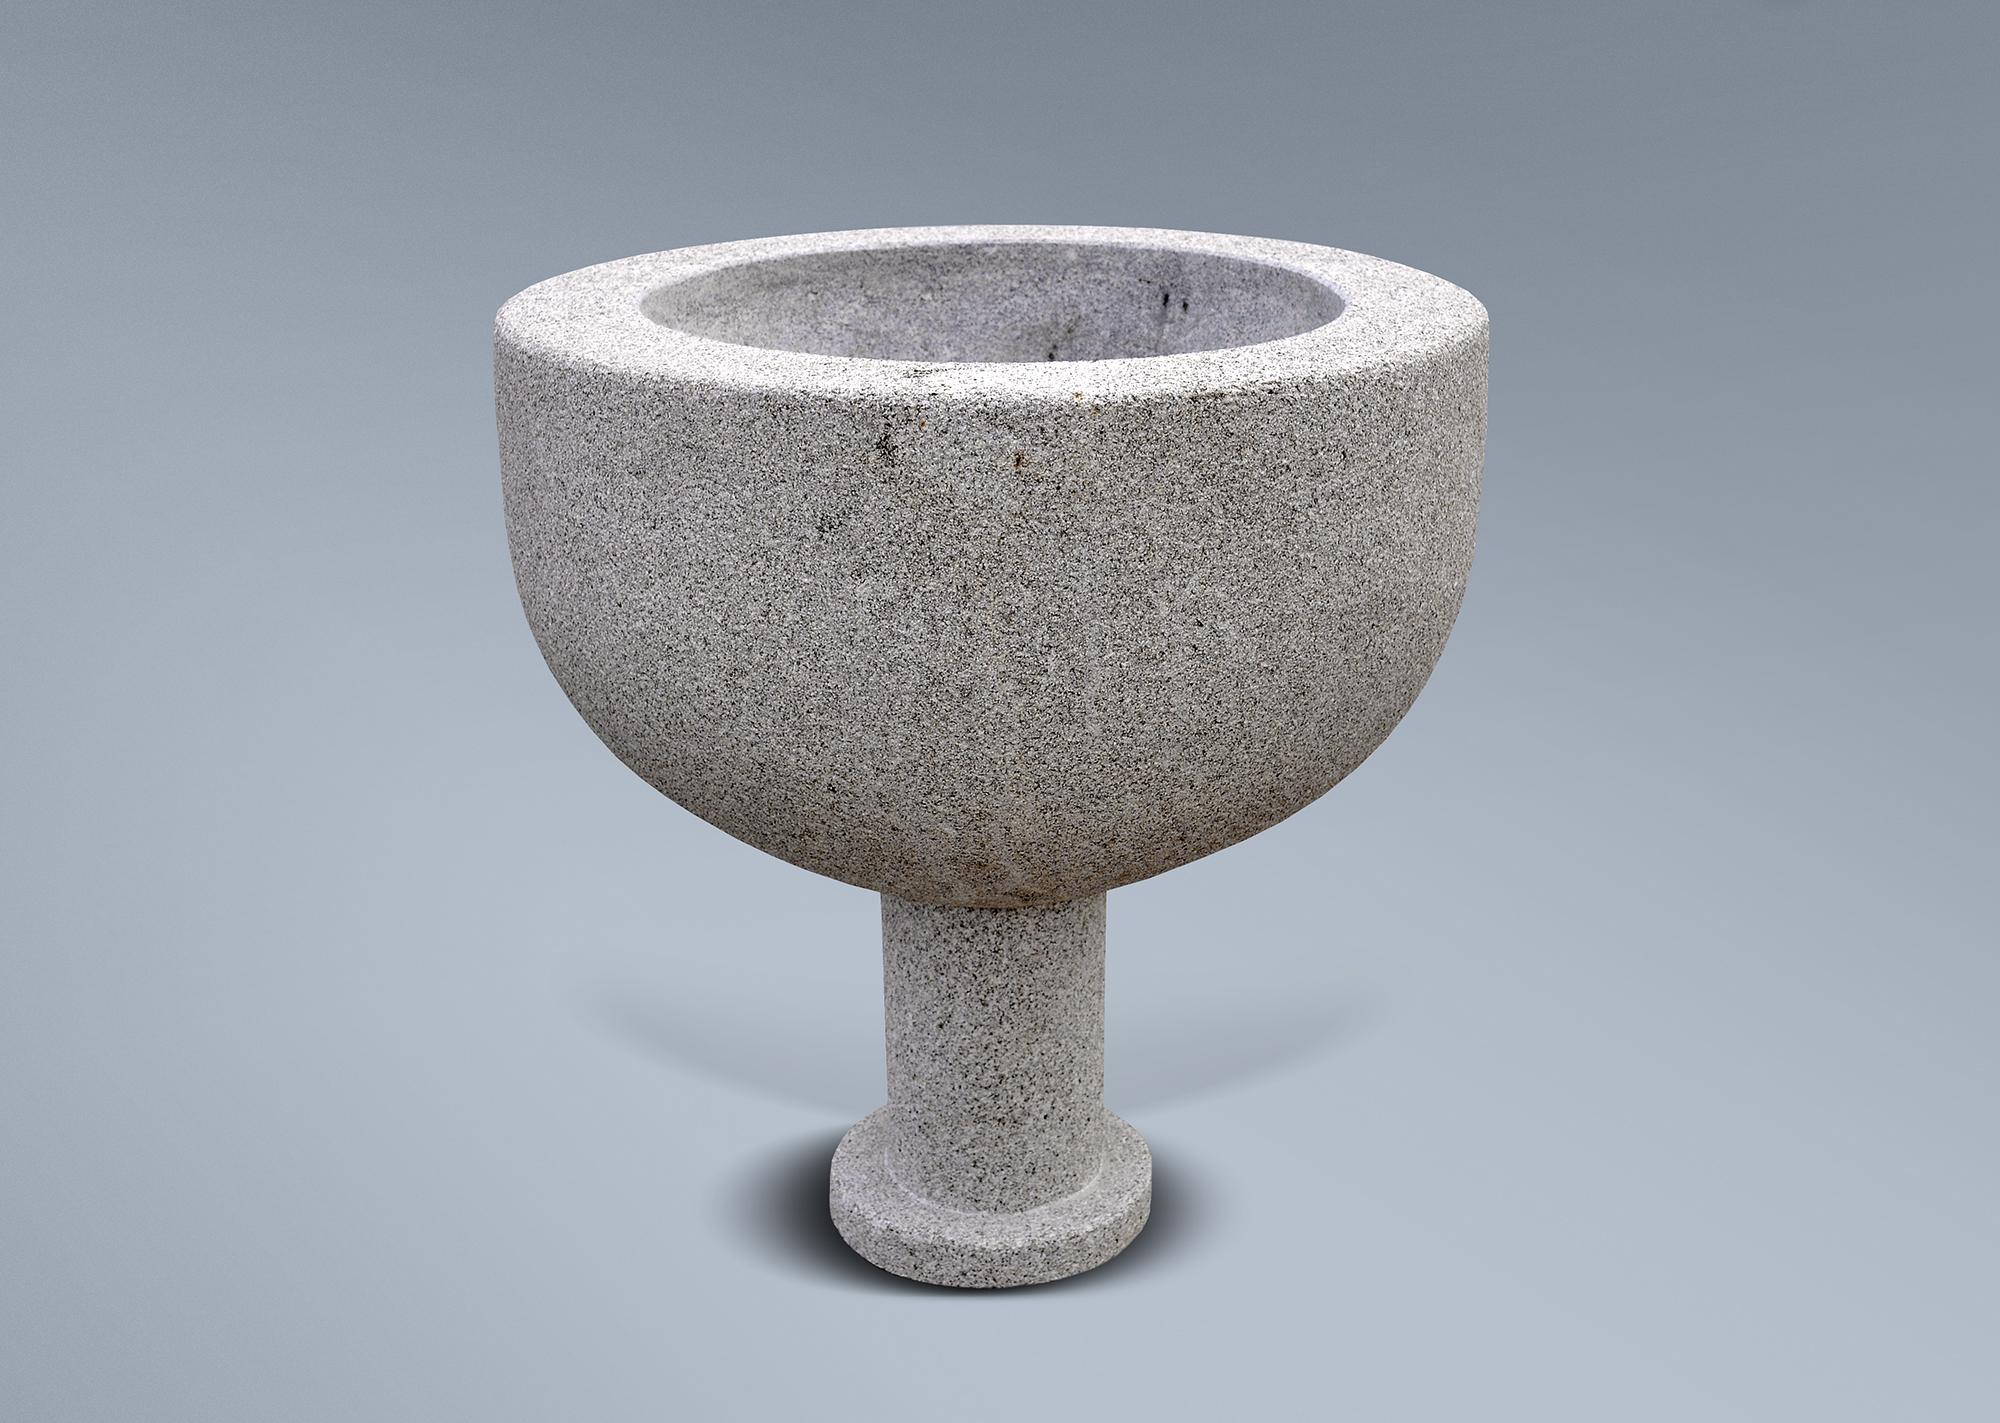 Pila bautismal en granito